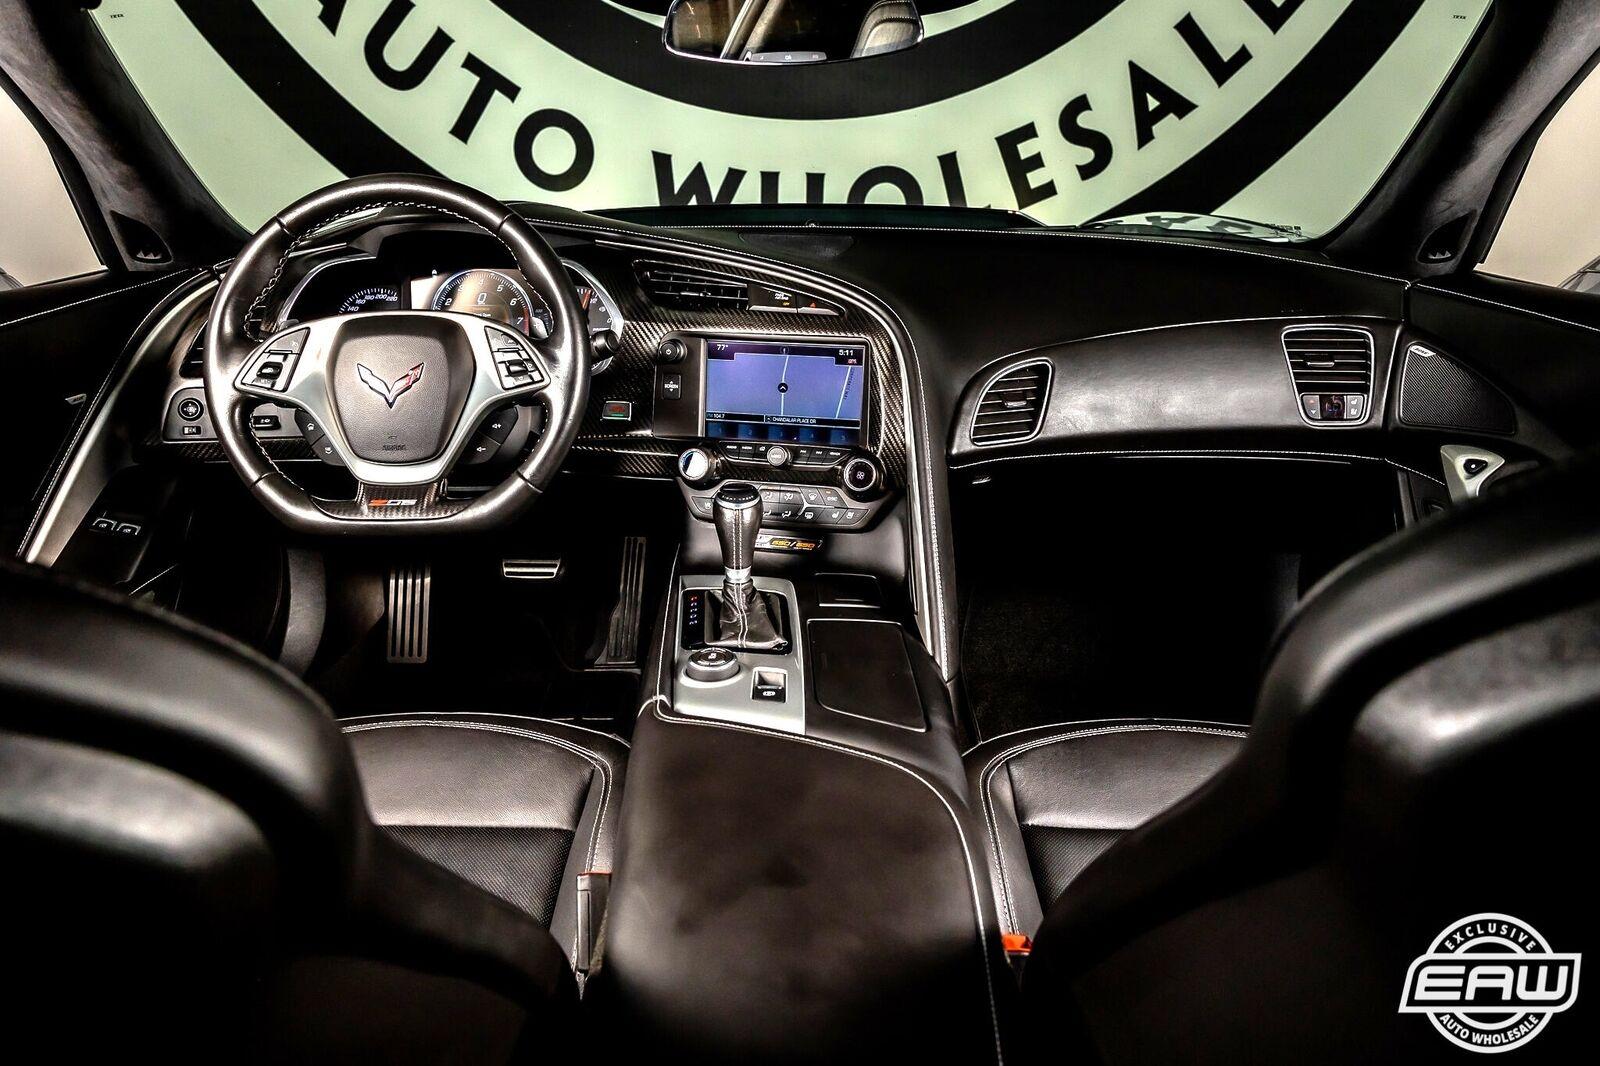 2016 Silver Chevrolet Corvette Z06 3LZ | C7 Corvette Photo 2